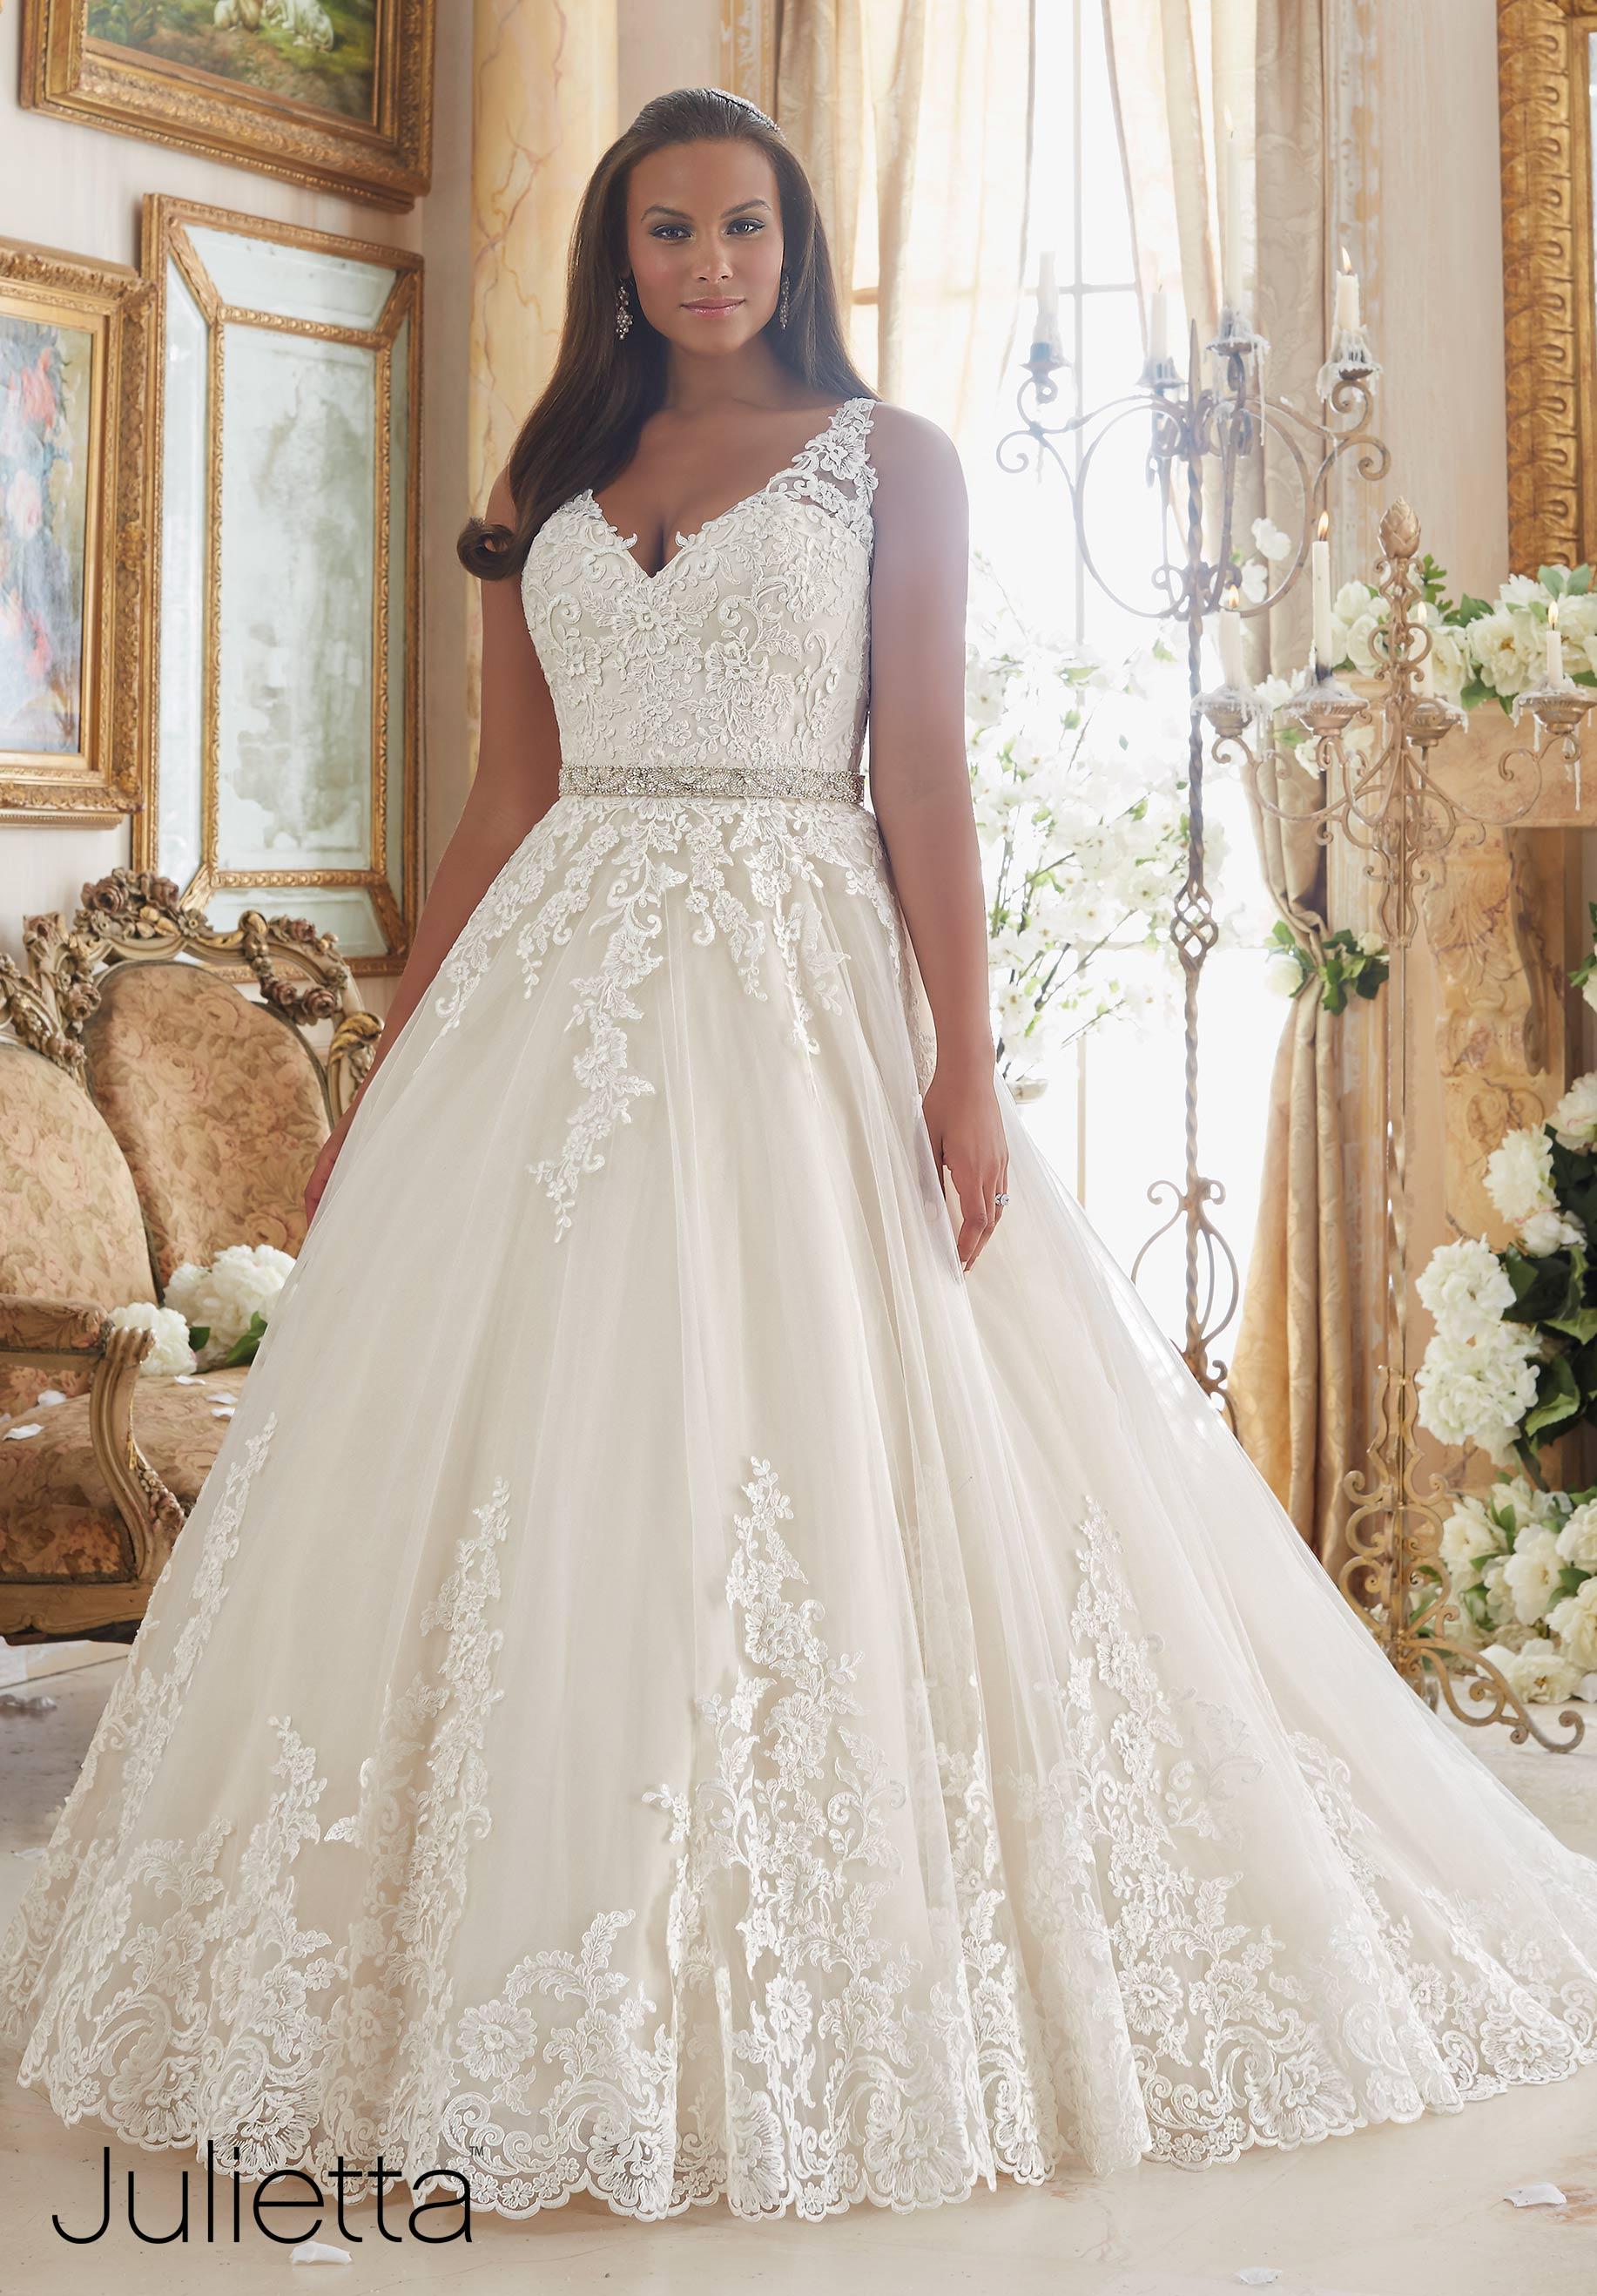 Plus Size Wedding Gowns | Mori Lee | Julietta Collection | Pretty Pear Bride